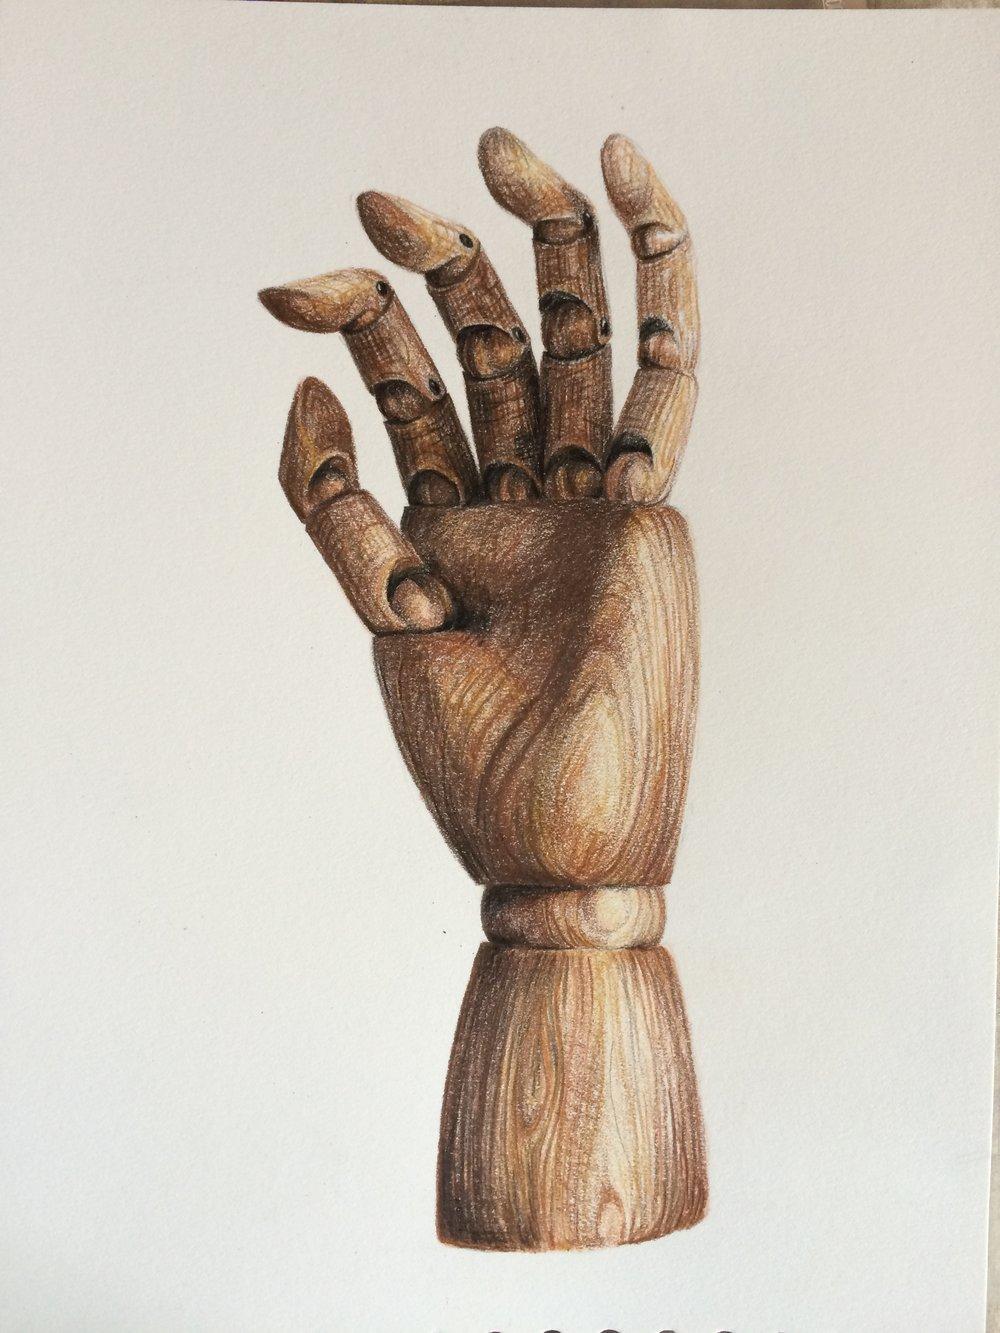 Texture study - wood